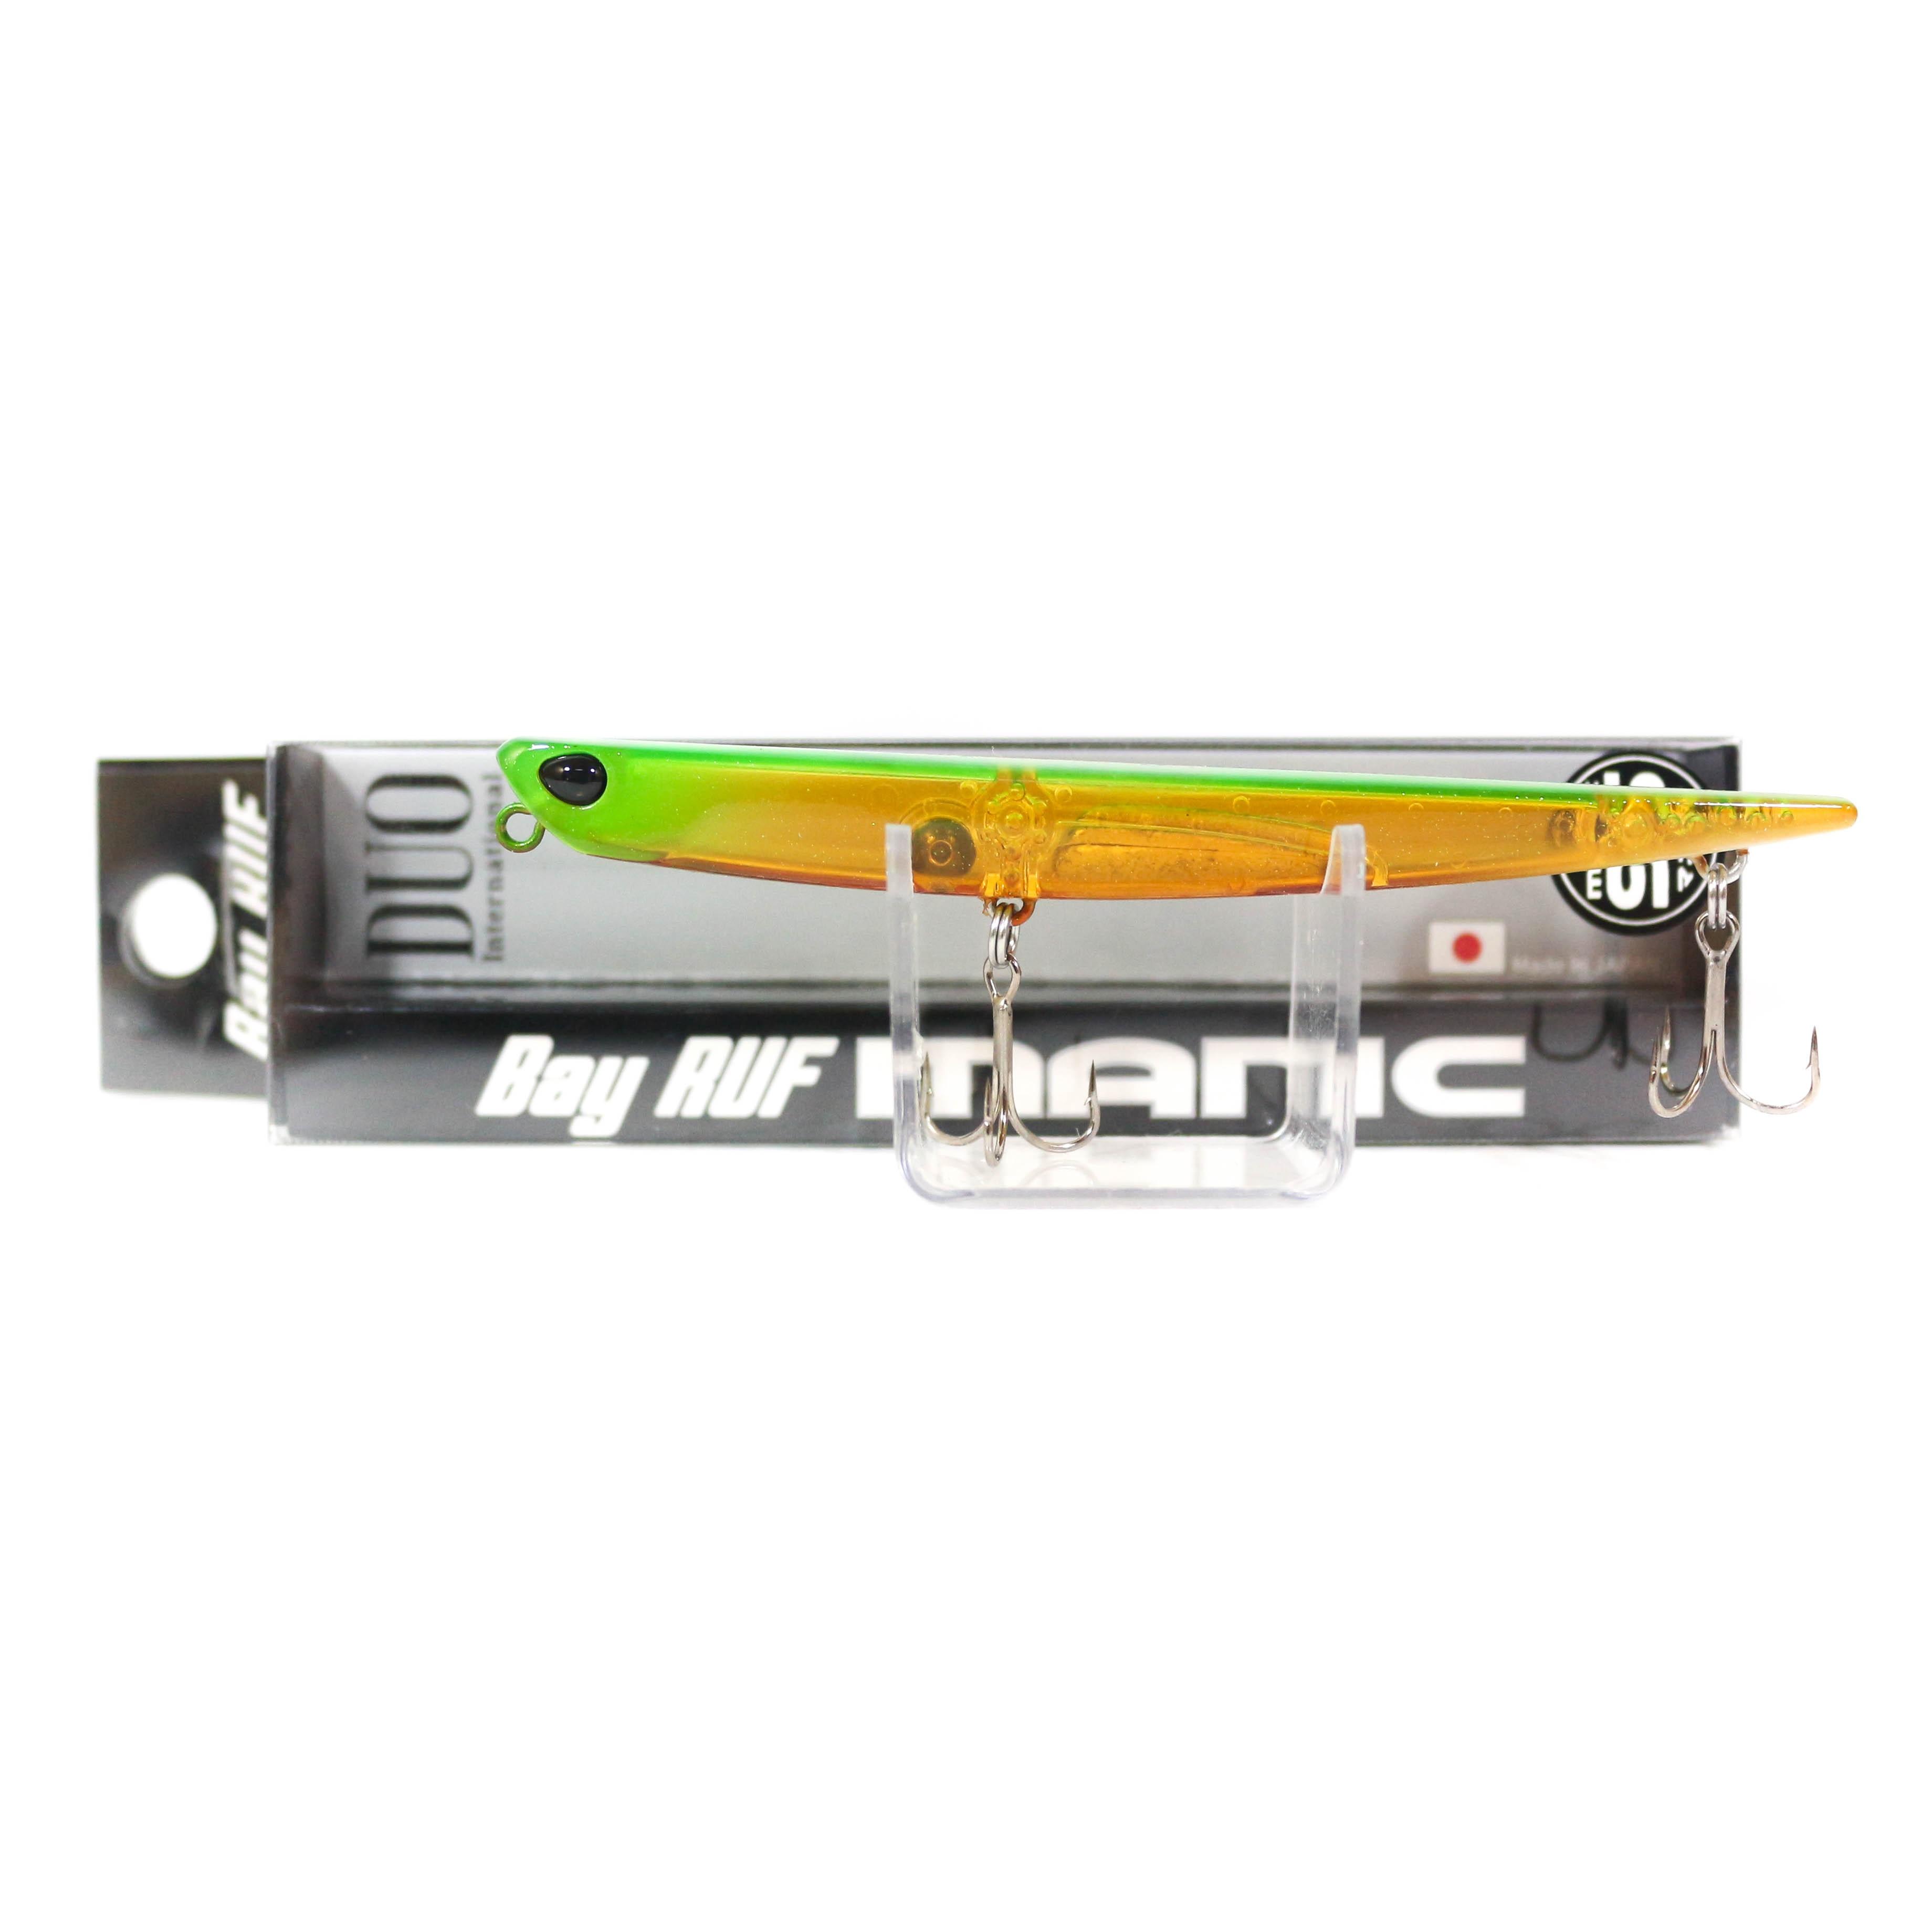 Duo Bay Ruf Manic 95 Pencil Sinking Lure CCC0166 (8981)